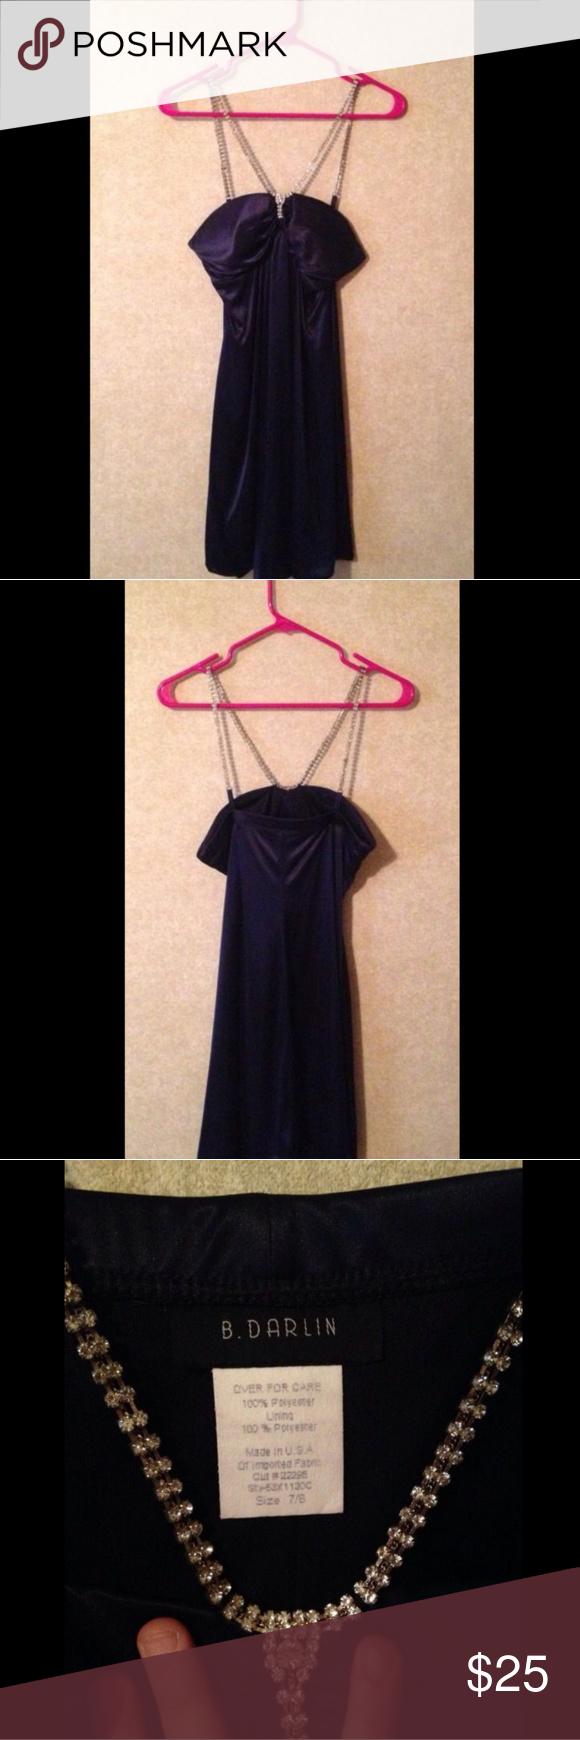 B darlin size formal dress fashion pinterest dresses